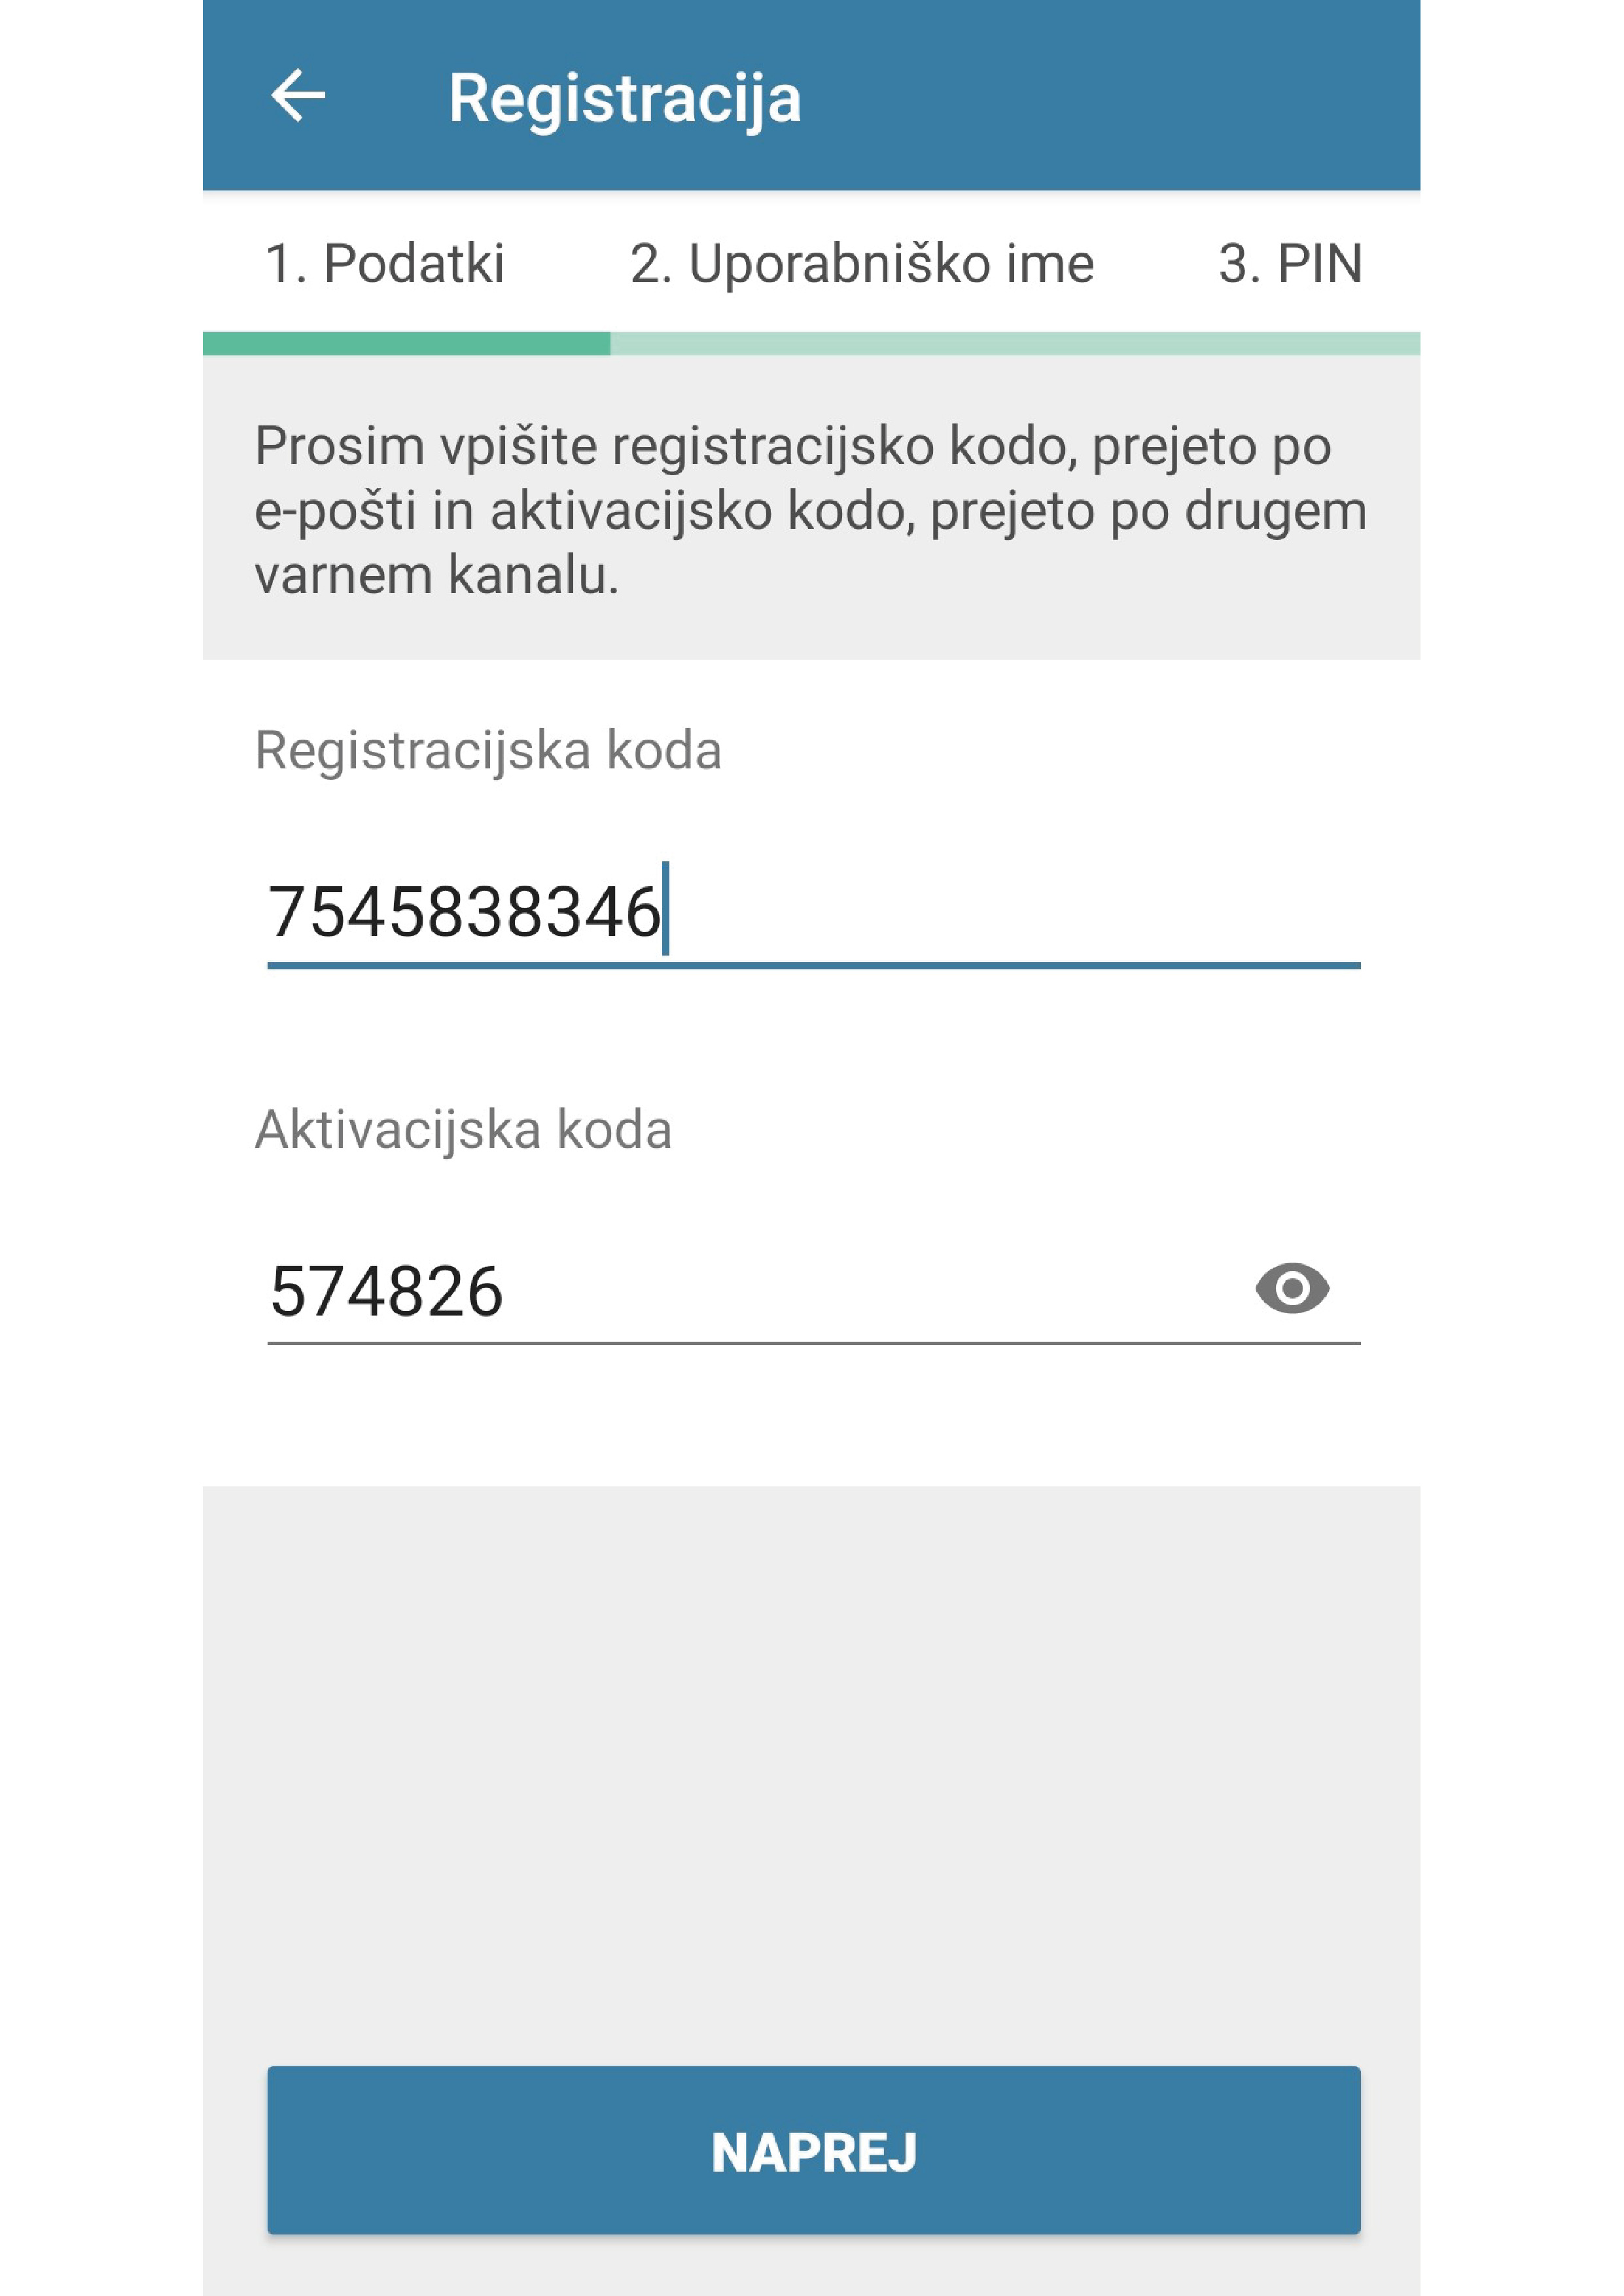 1. Registracija